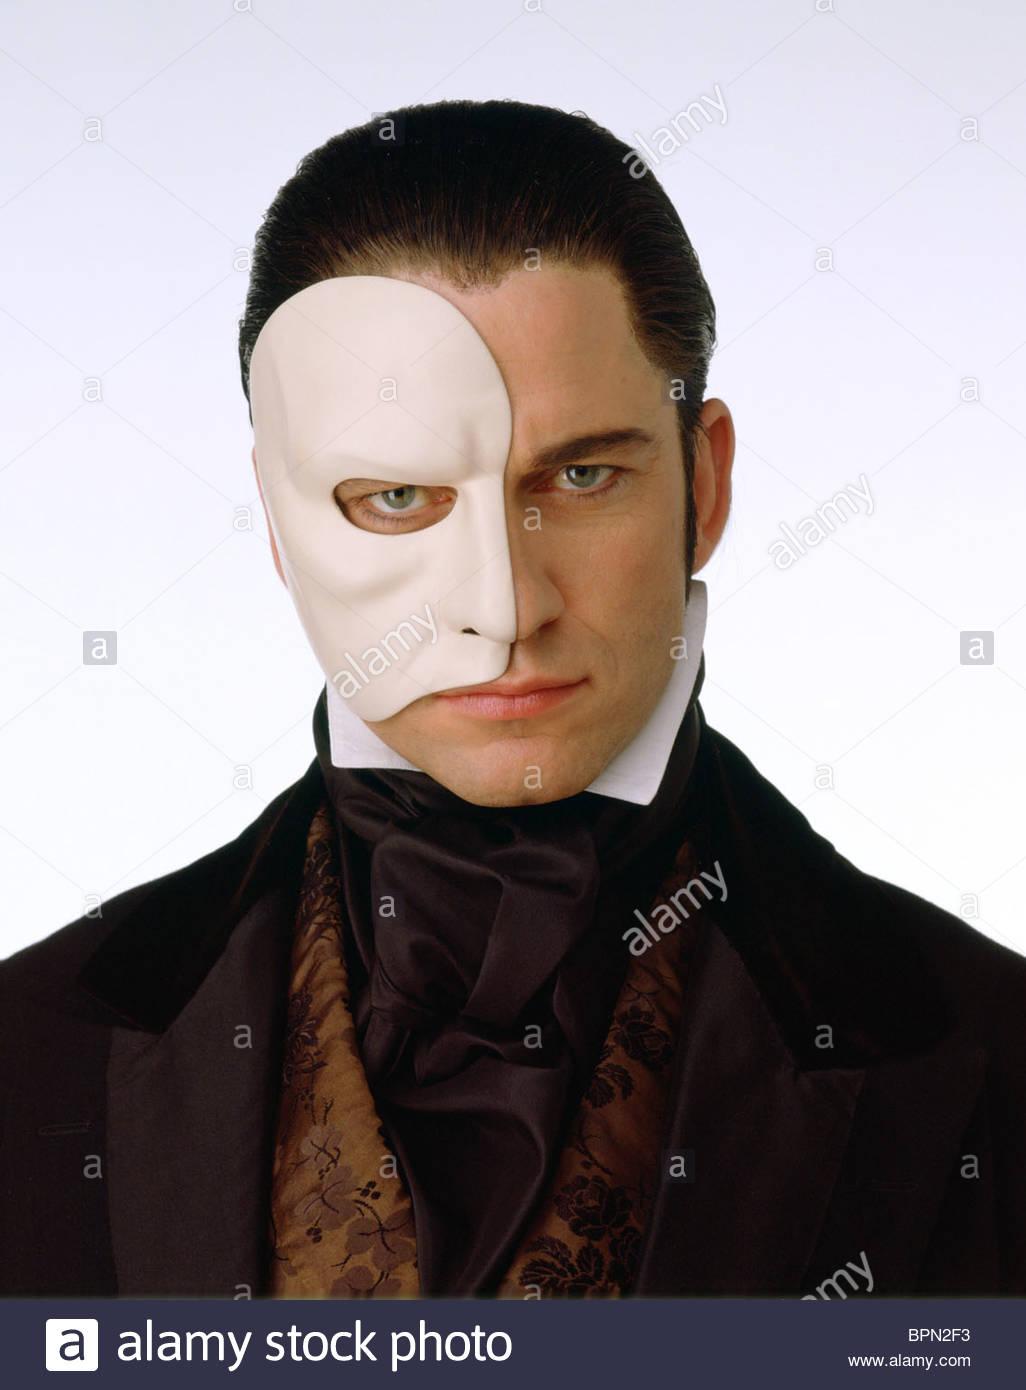 phantom mask stock photos phantom mask stock images alamy